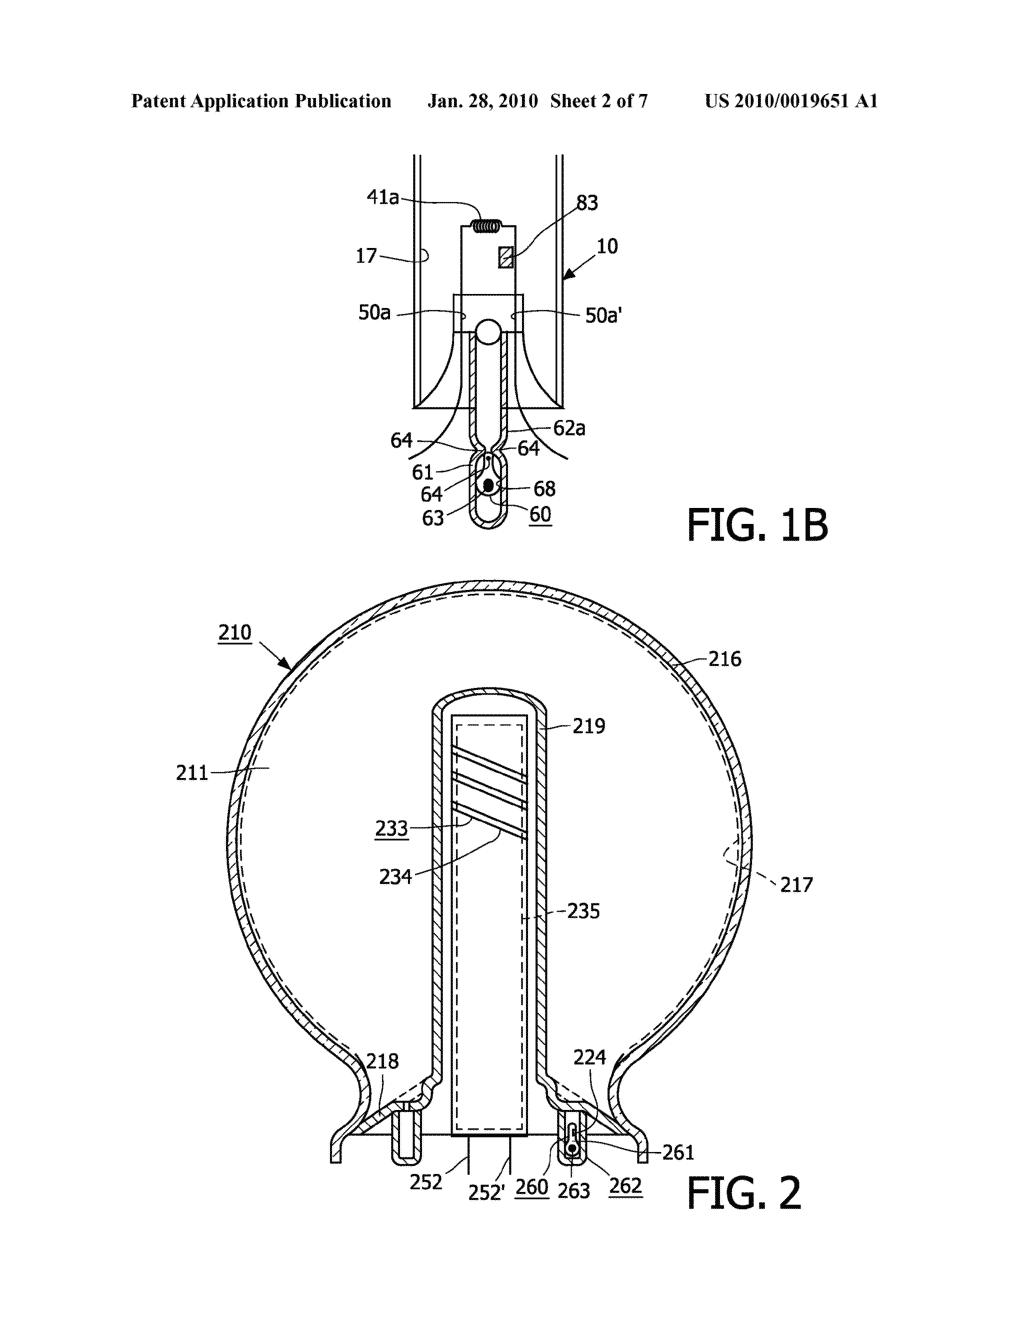 Wiring Diagram Of Mercury Vapour Lamp